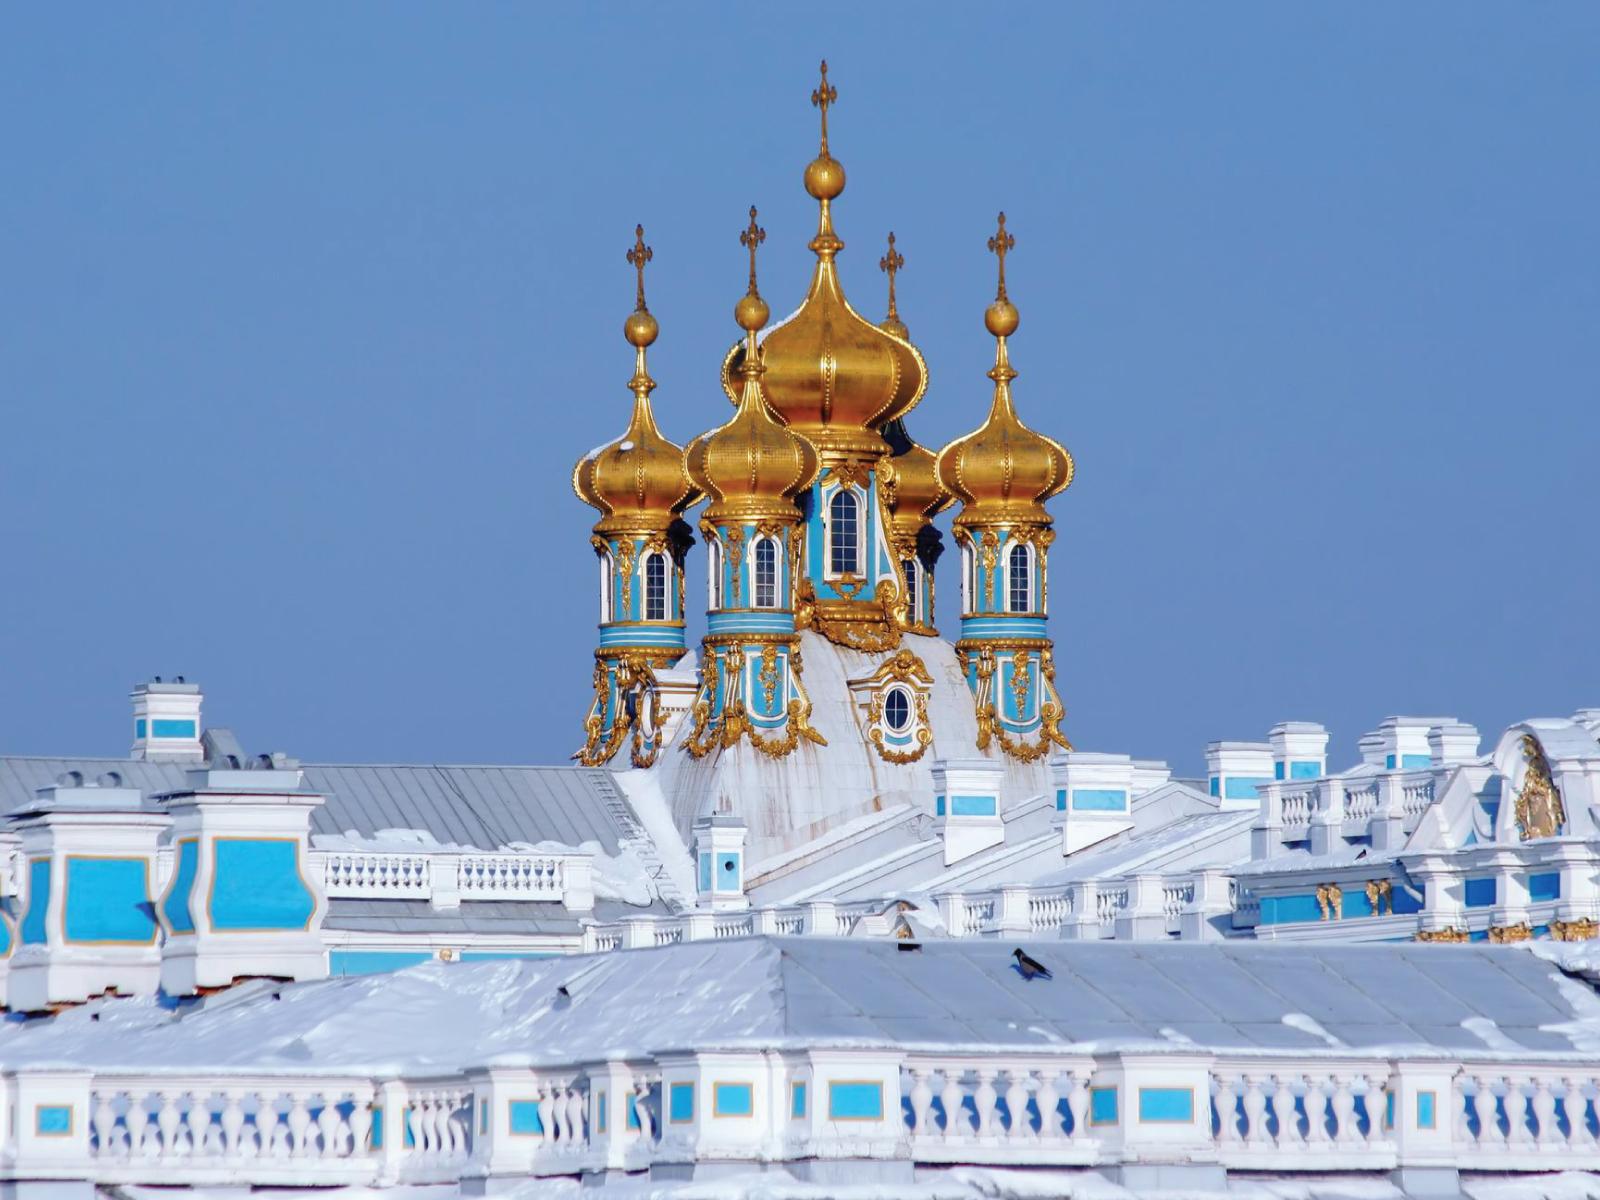 Russland - Ekaterinenpalast